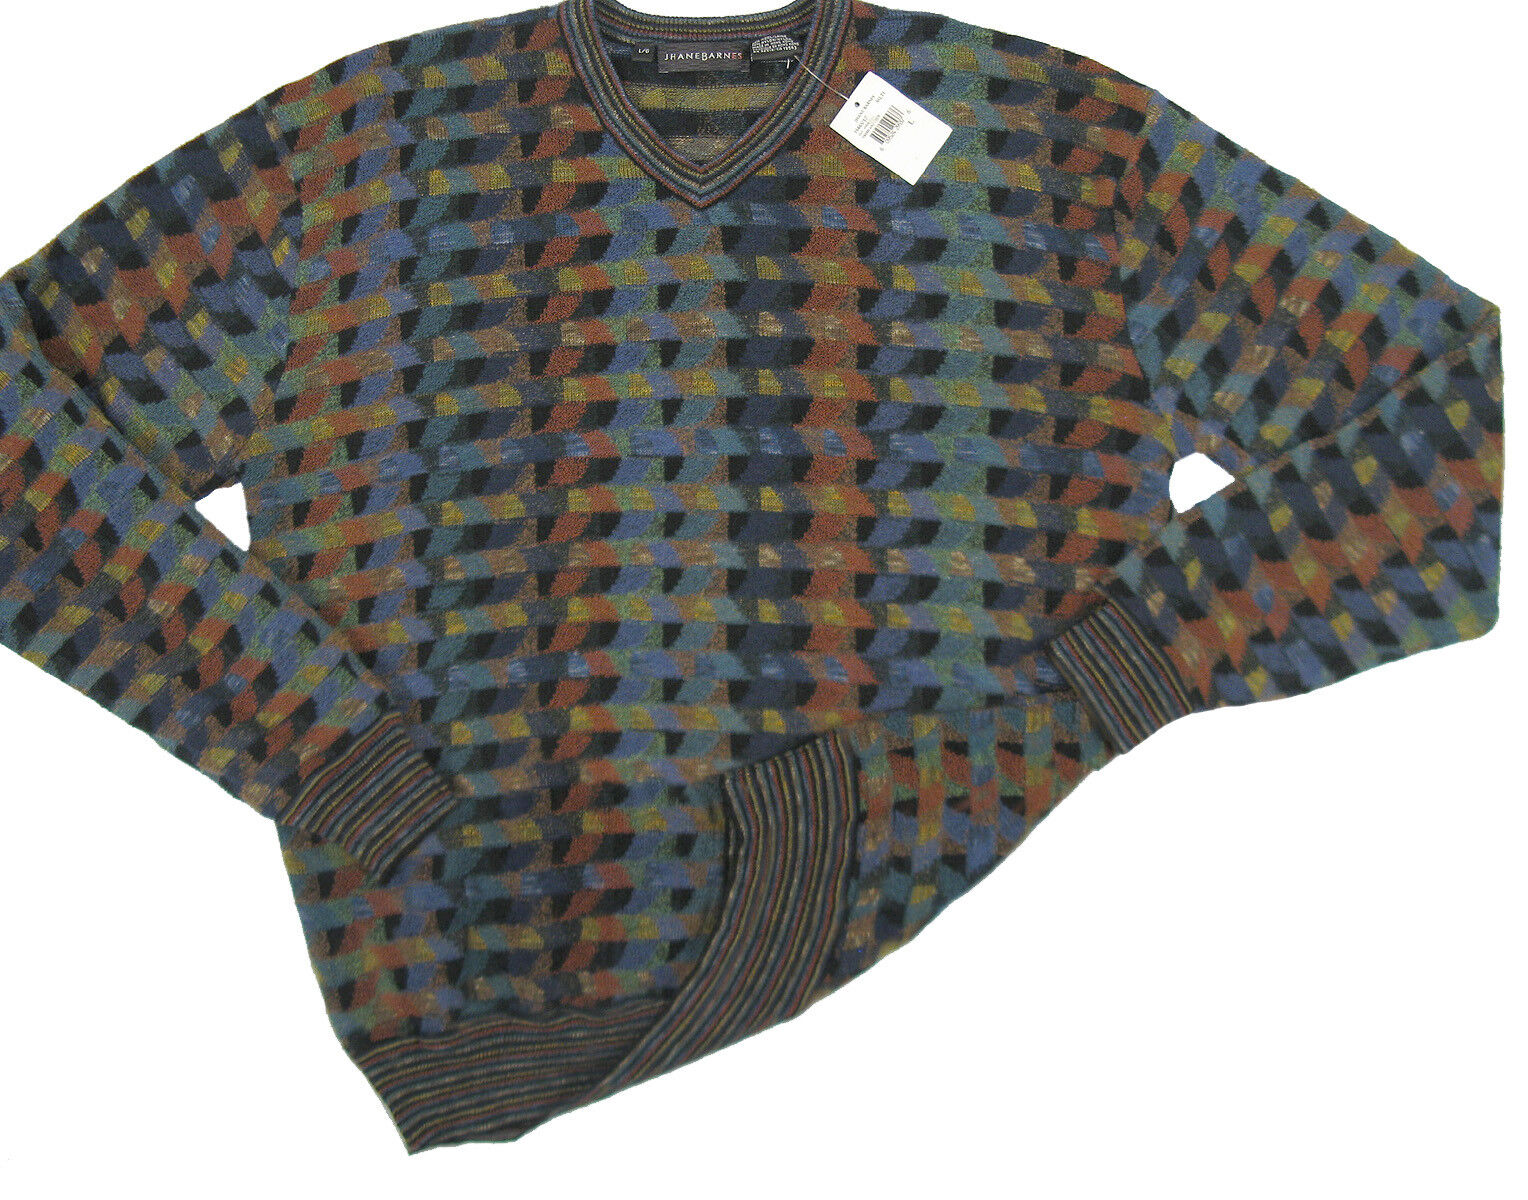 NEW  295 Jhane Barnes Fine Geometric Pattern Sweater   XL  Fall / Winter Weight